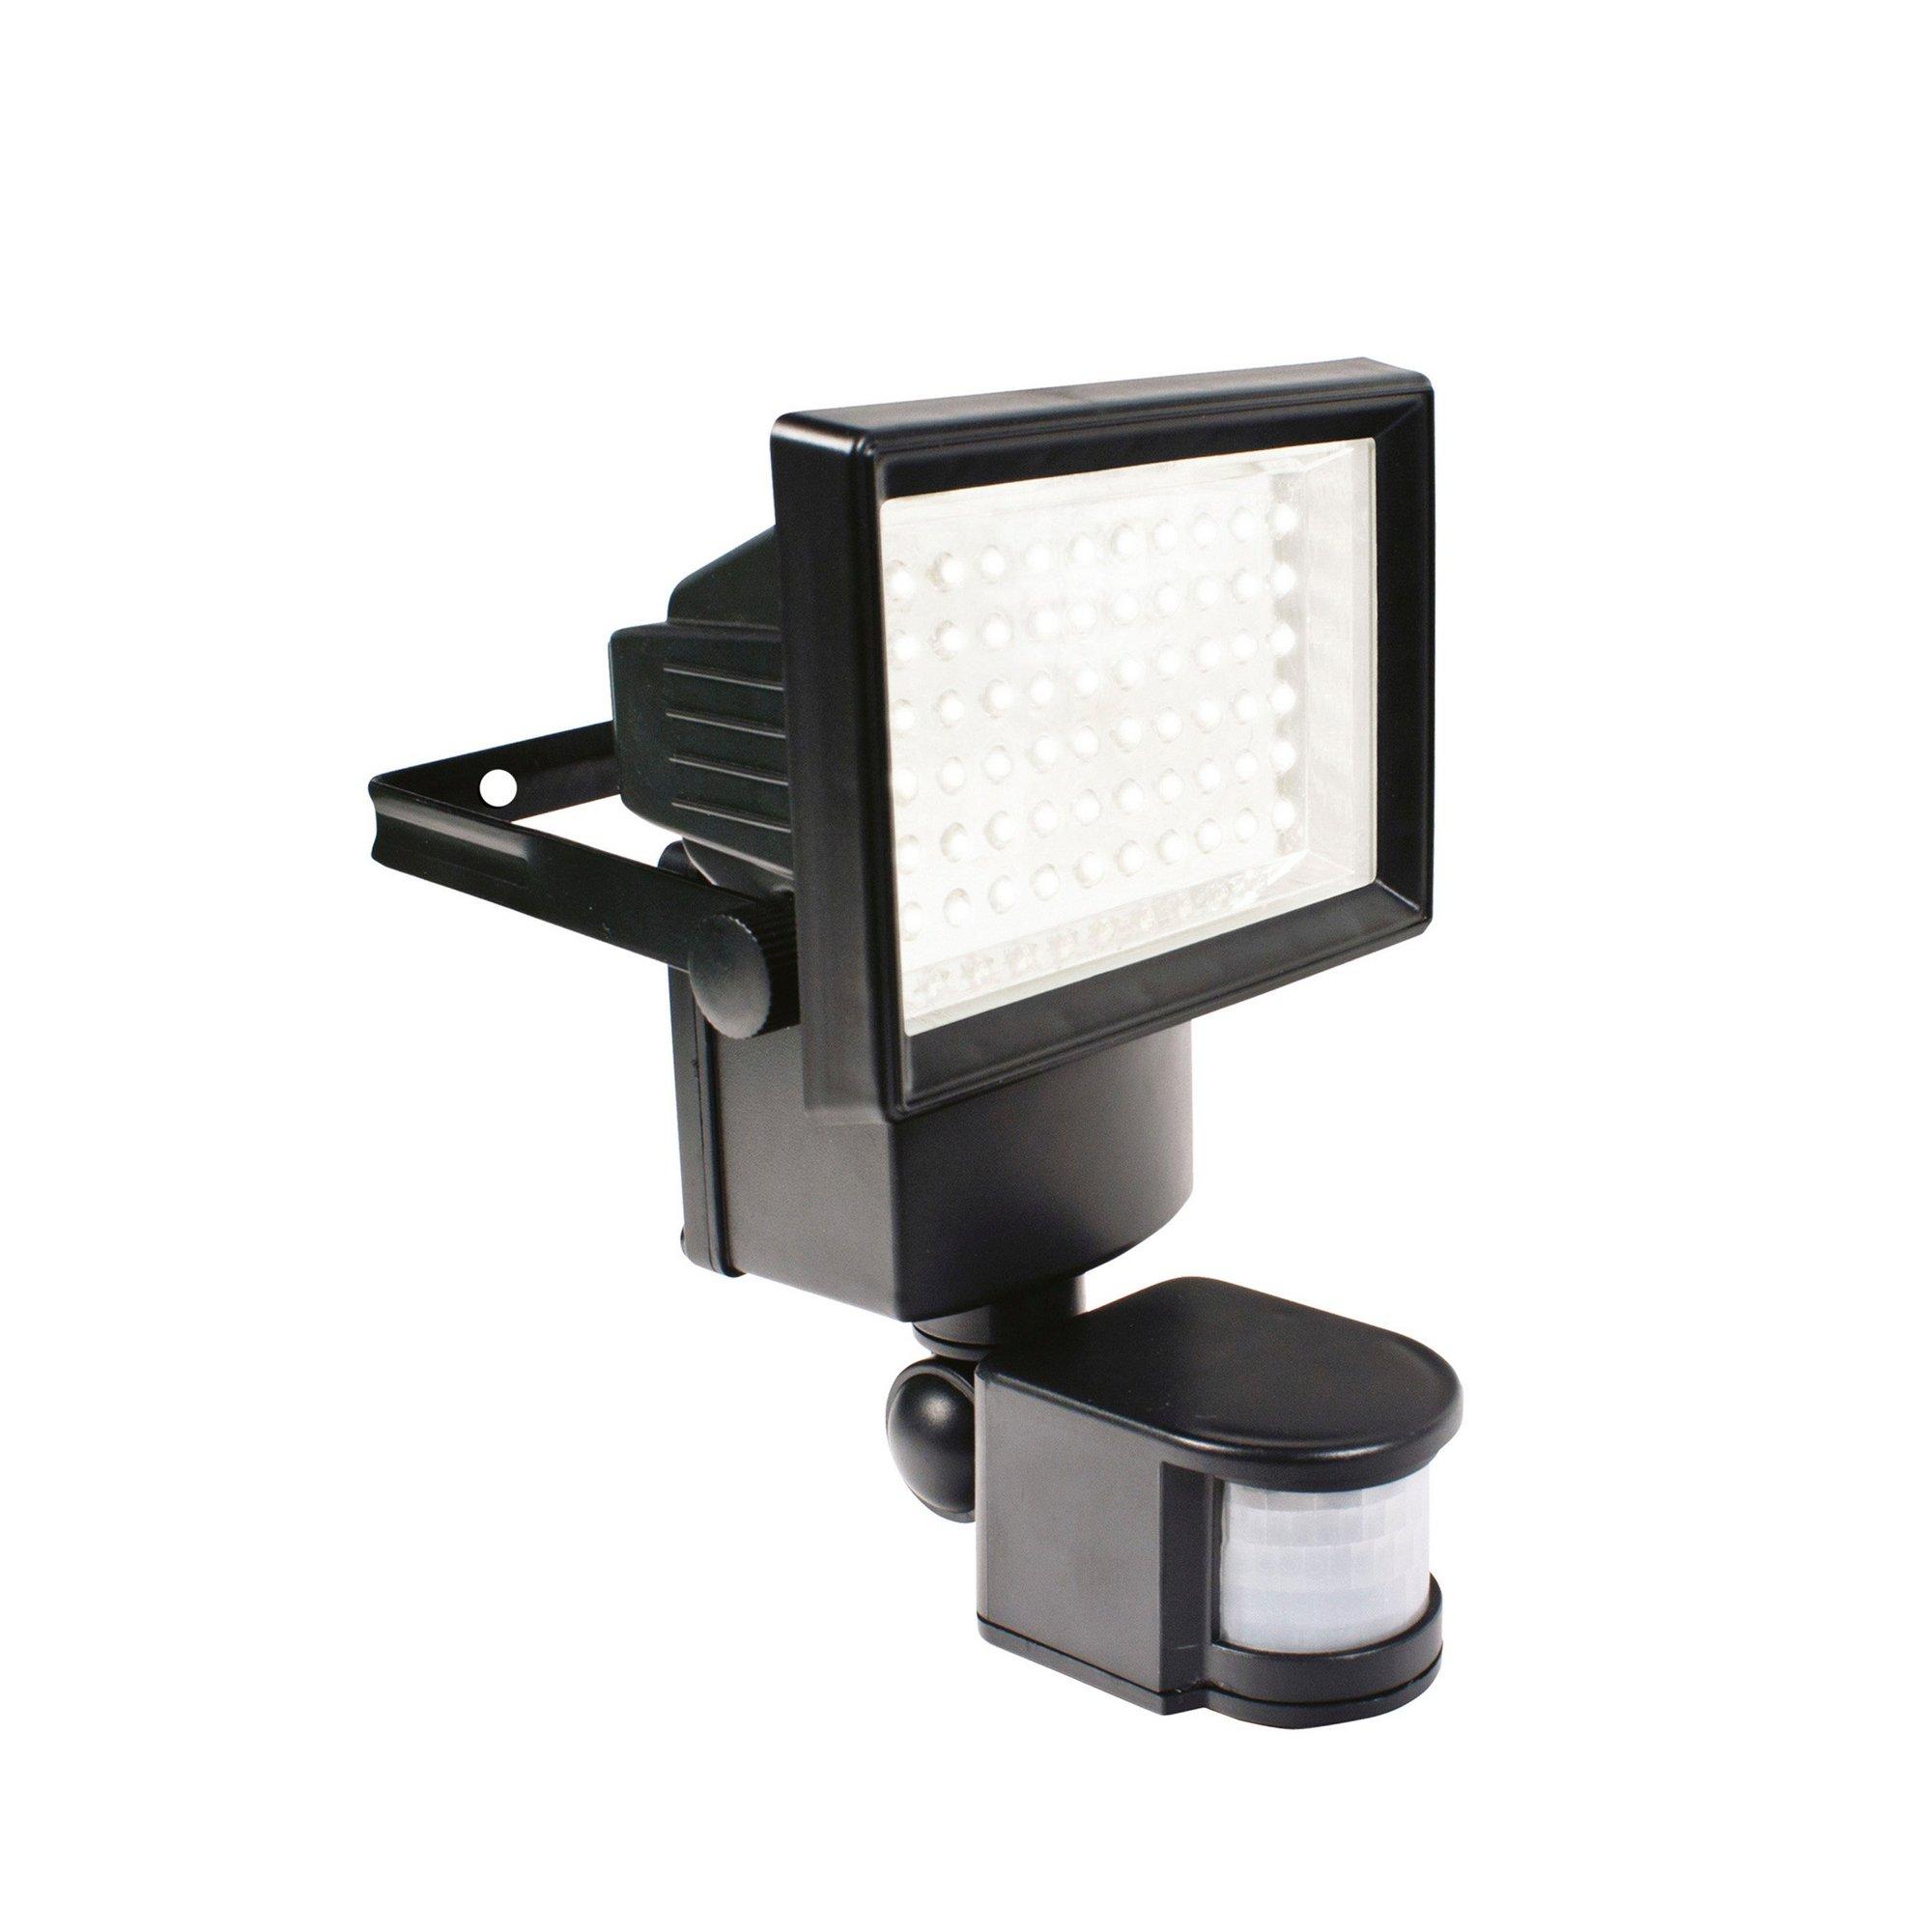 Image of Solar Aura Security Light with Motion Sensor